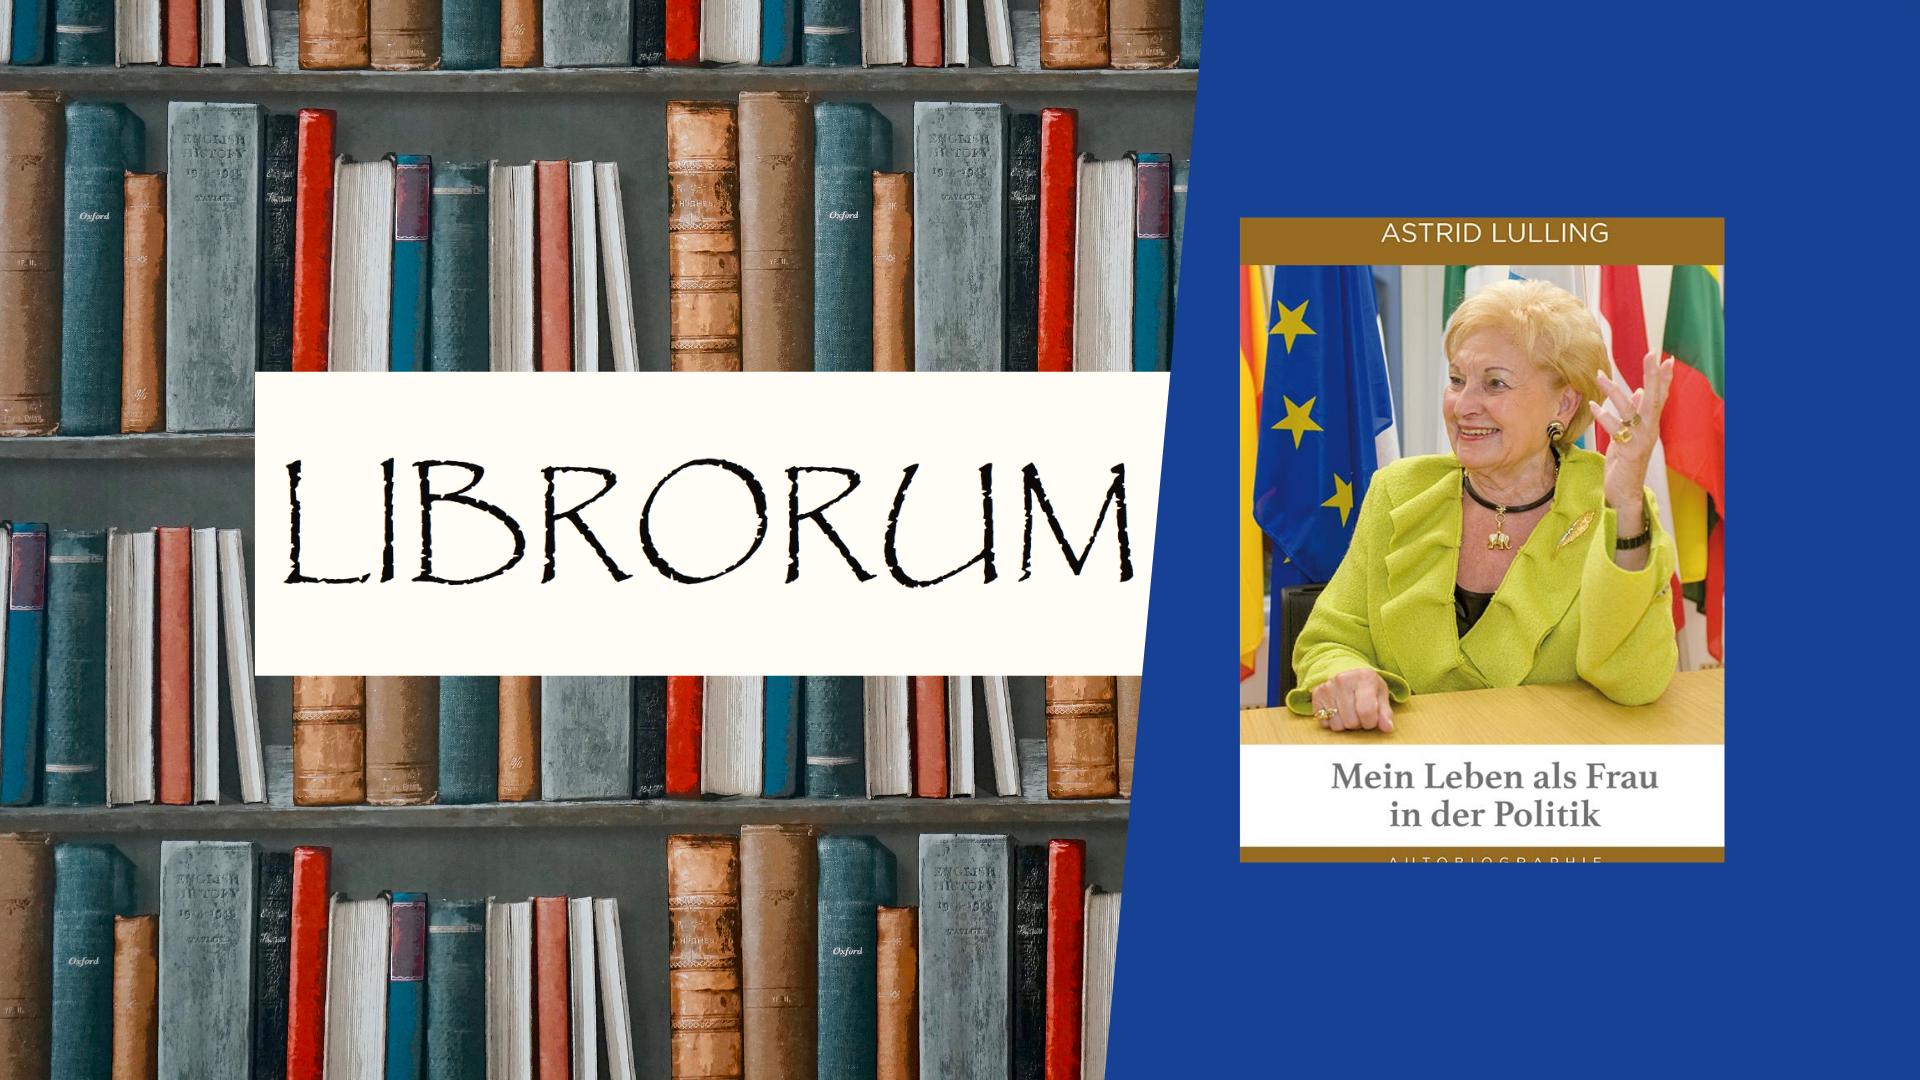 'Mein Leben als Frau in der Politik' par Astrid Lulling